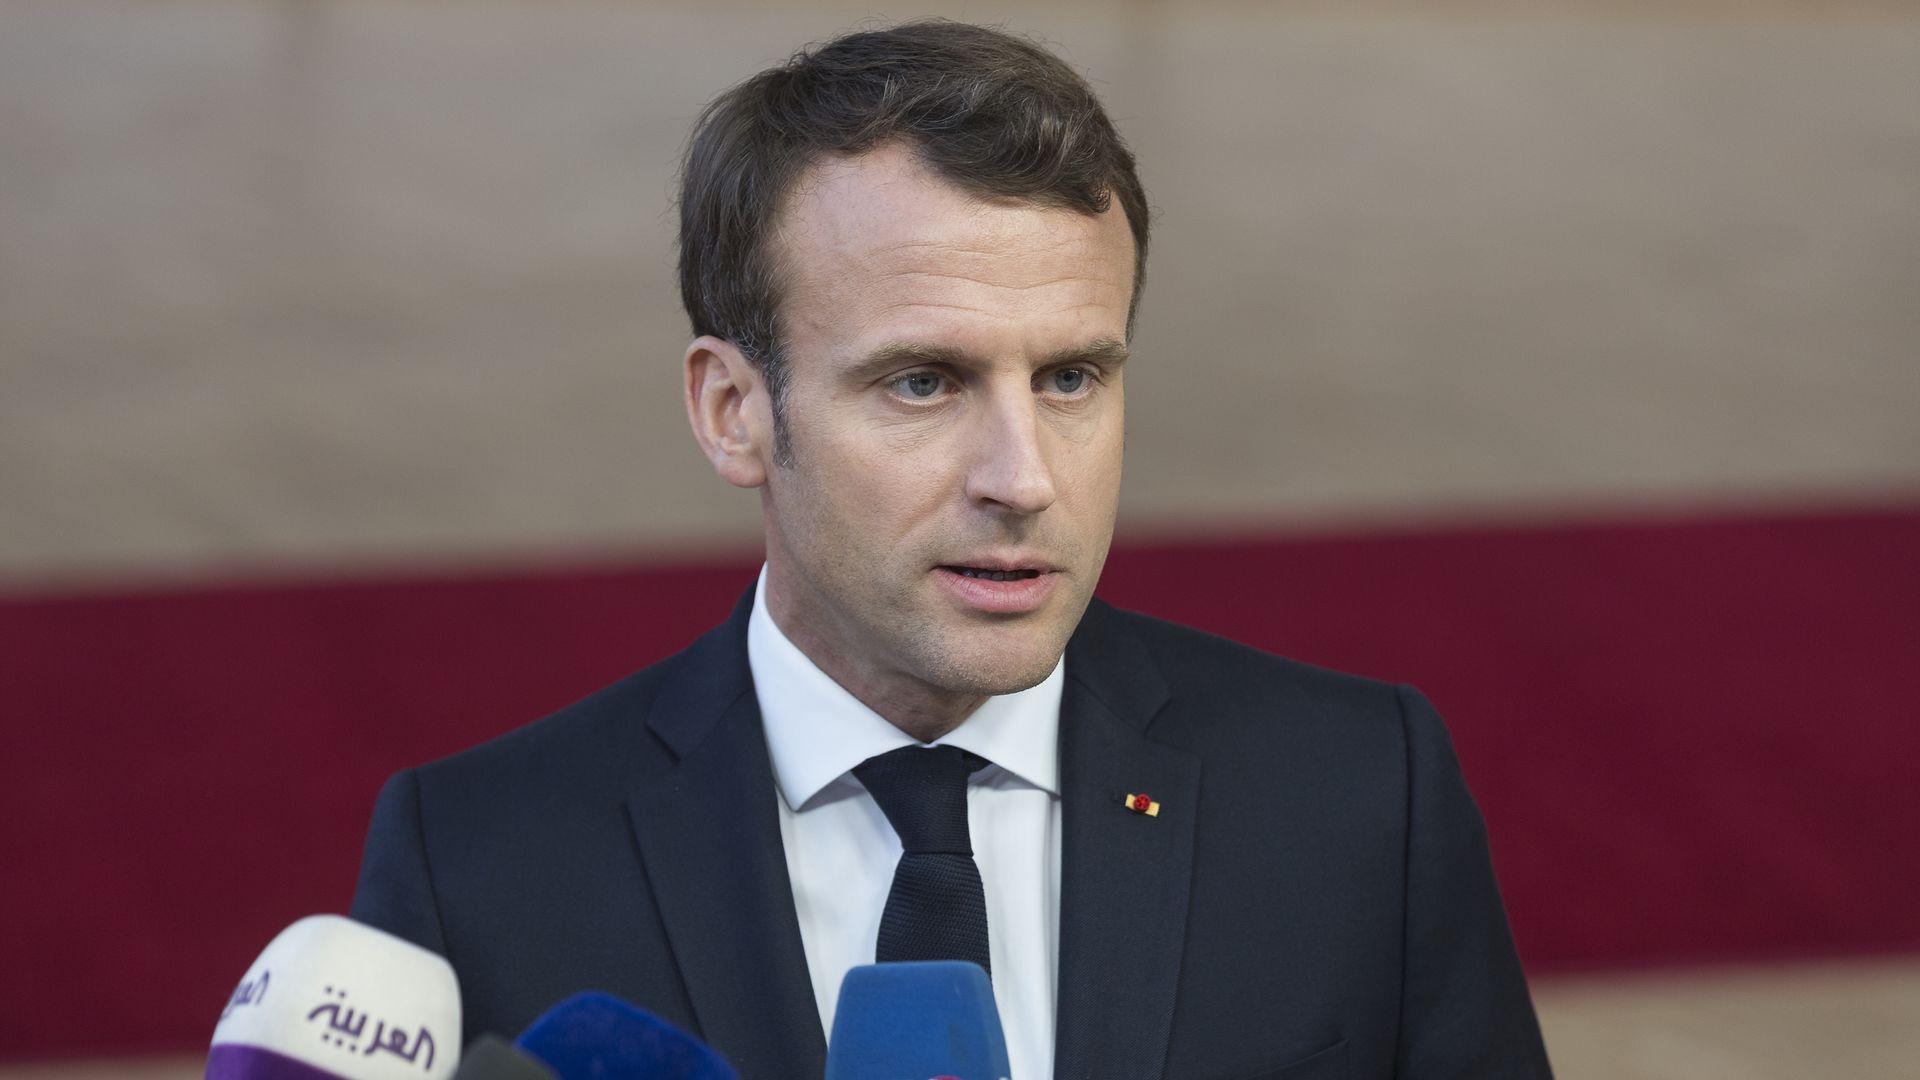 Emmanuel Macron wants cathedral rebuilt in 5 years